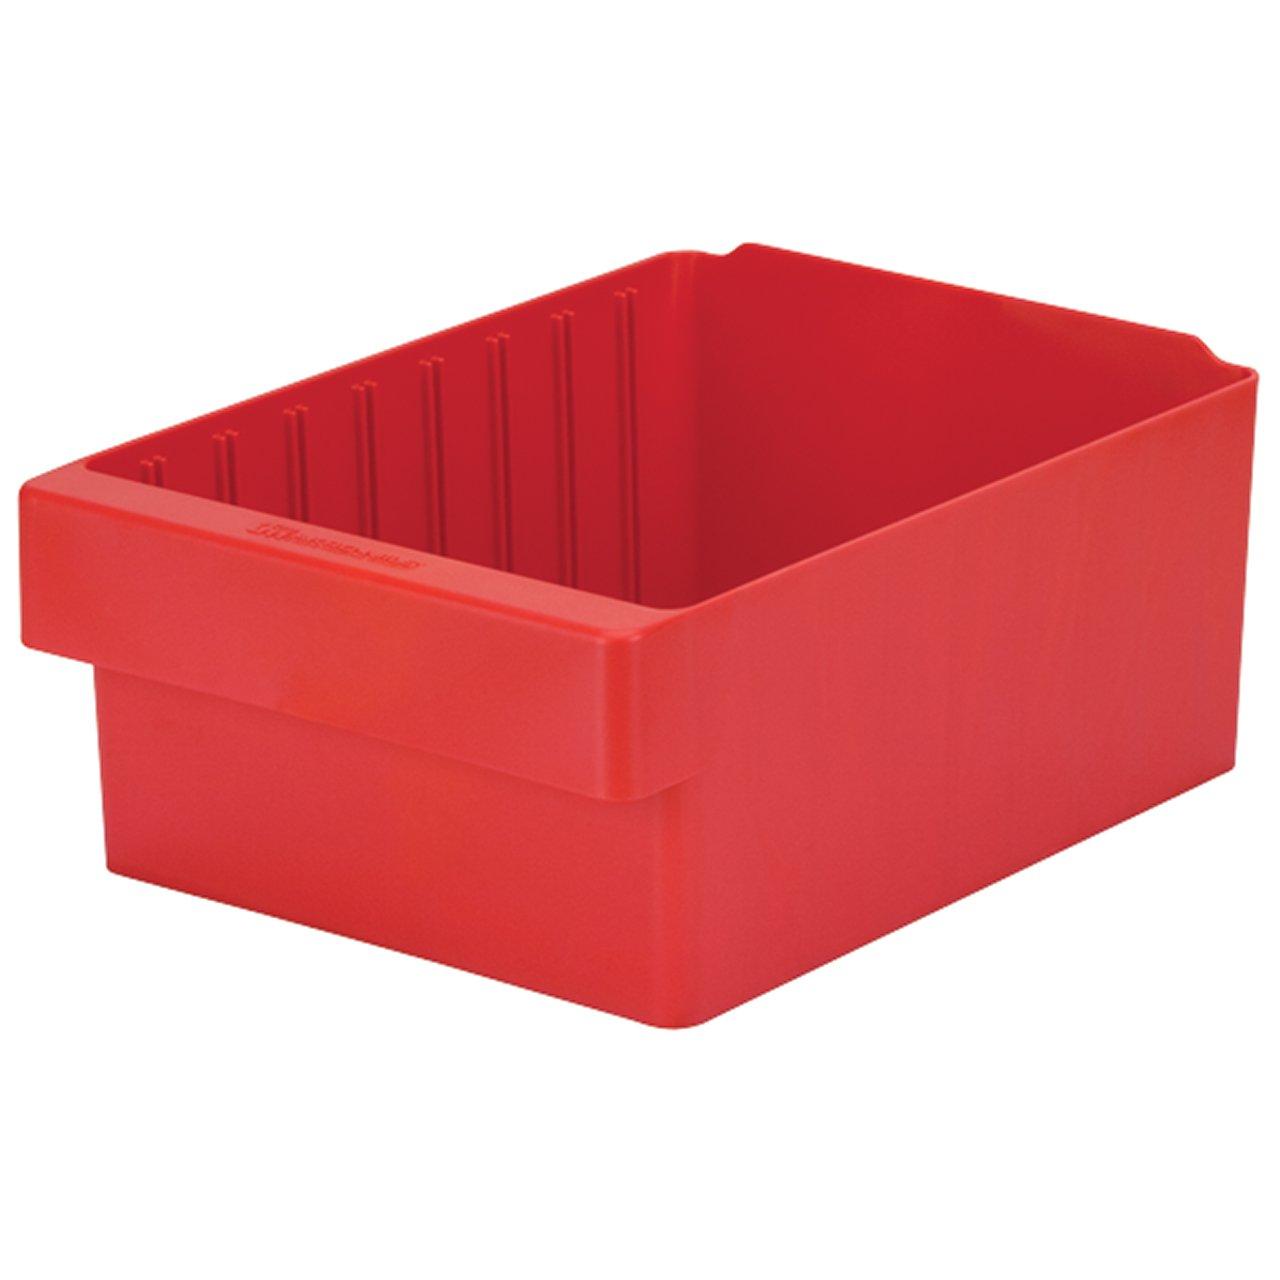 Akro-Mils 31182 AkroDrawer Plastic Storage Drawer, 11-5/8''L x 8-3/8'' W x 4-5/8 H, Red, Case of 4